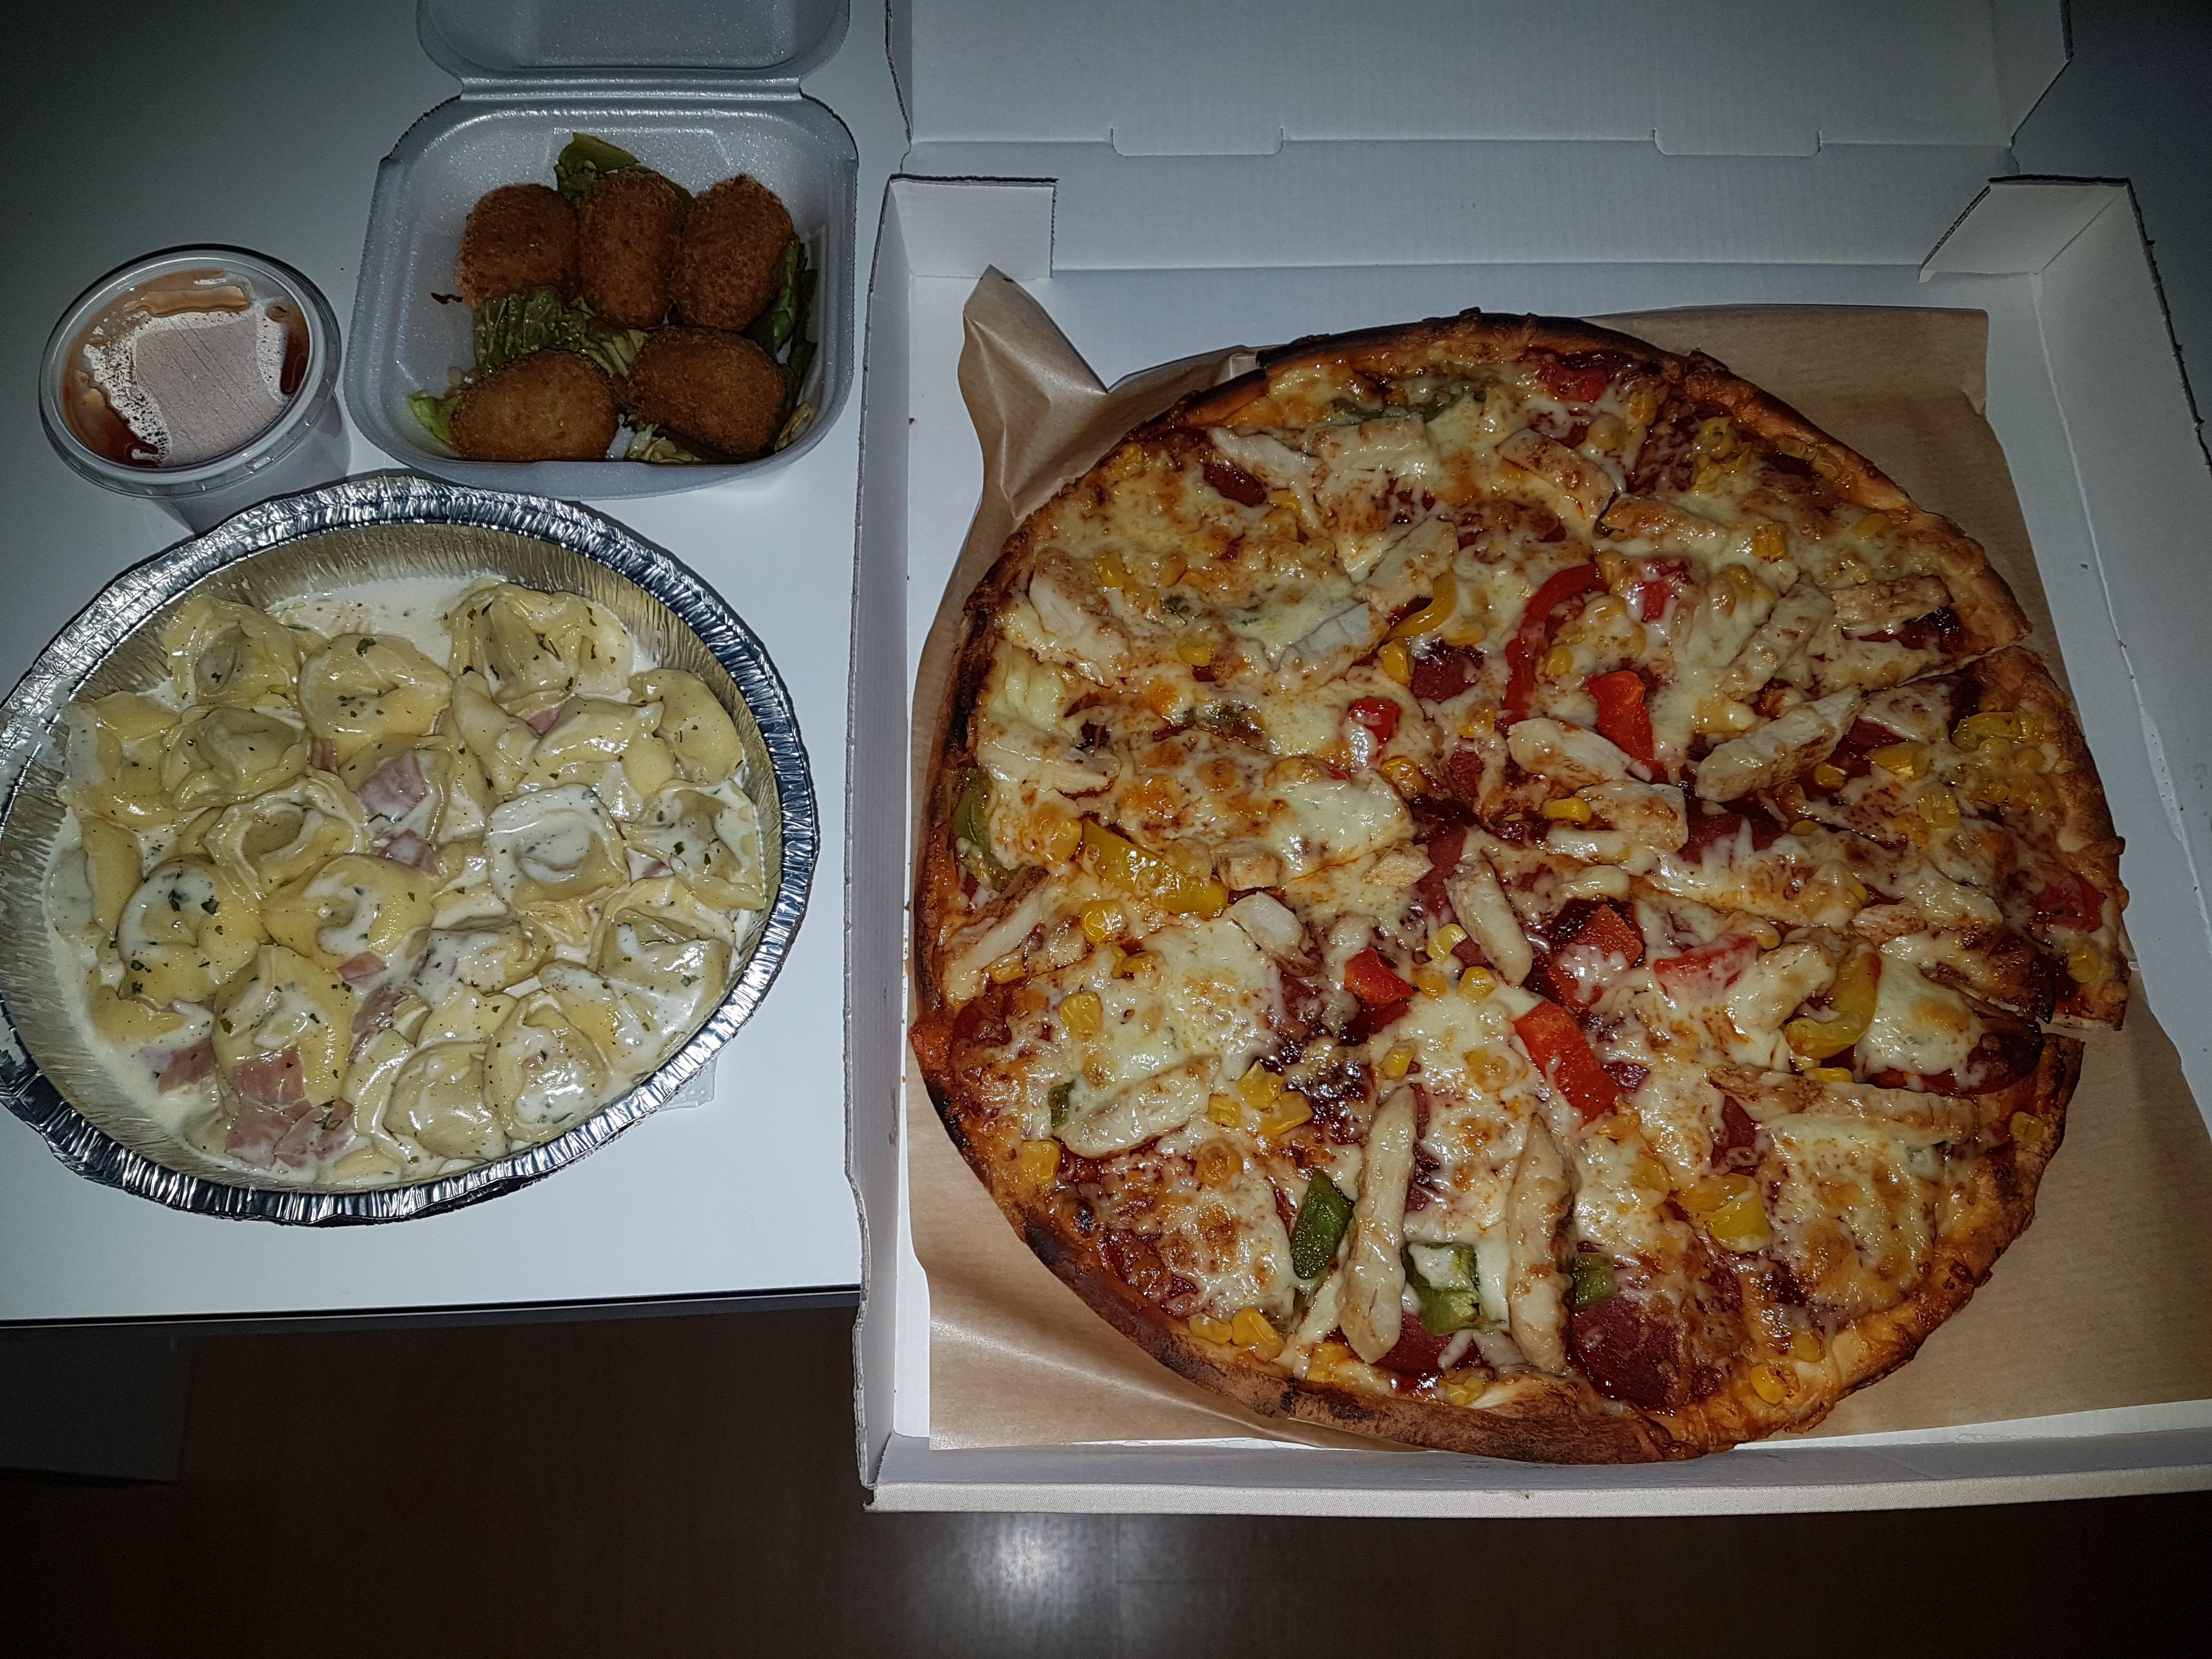 https://foodloader.net/Holz_2018-09-28_Pizza_und_Tortellini.jpg